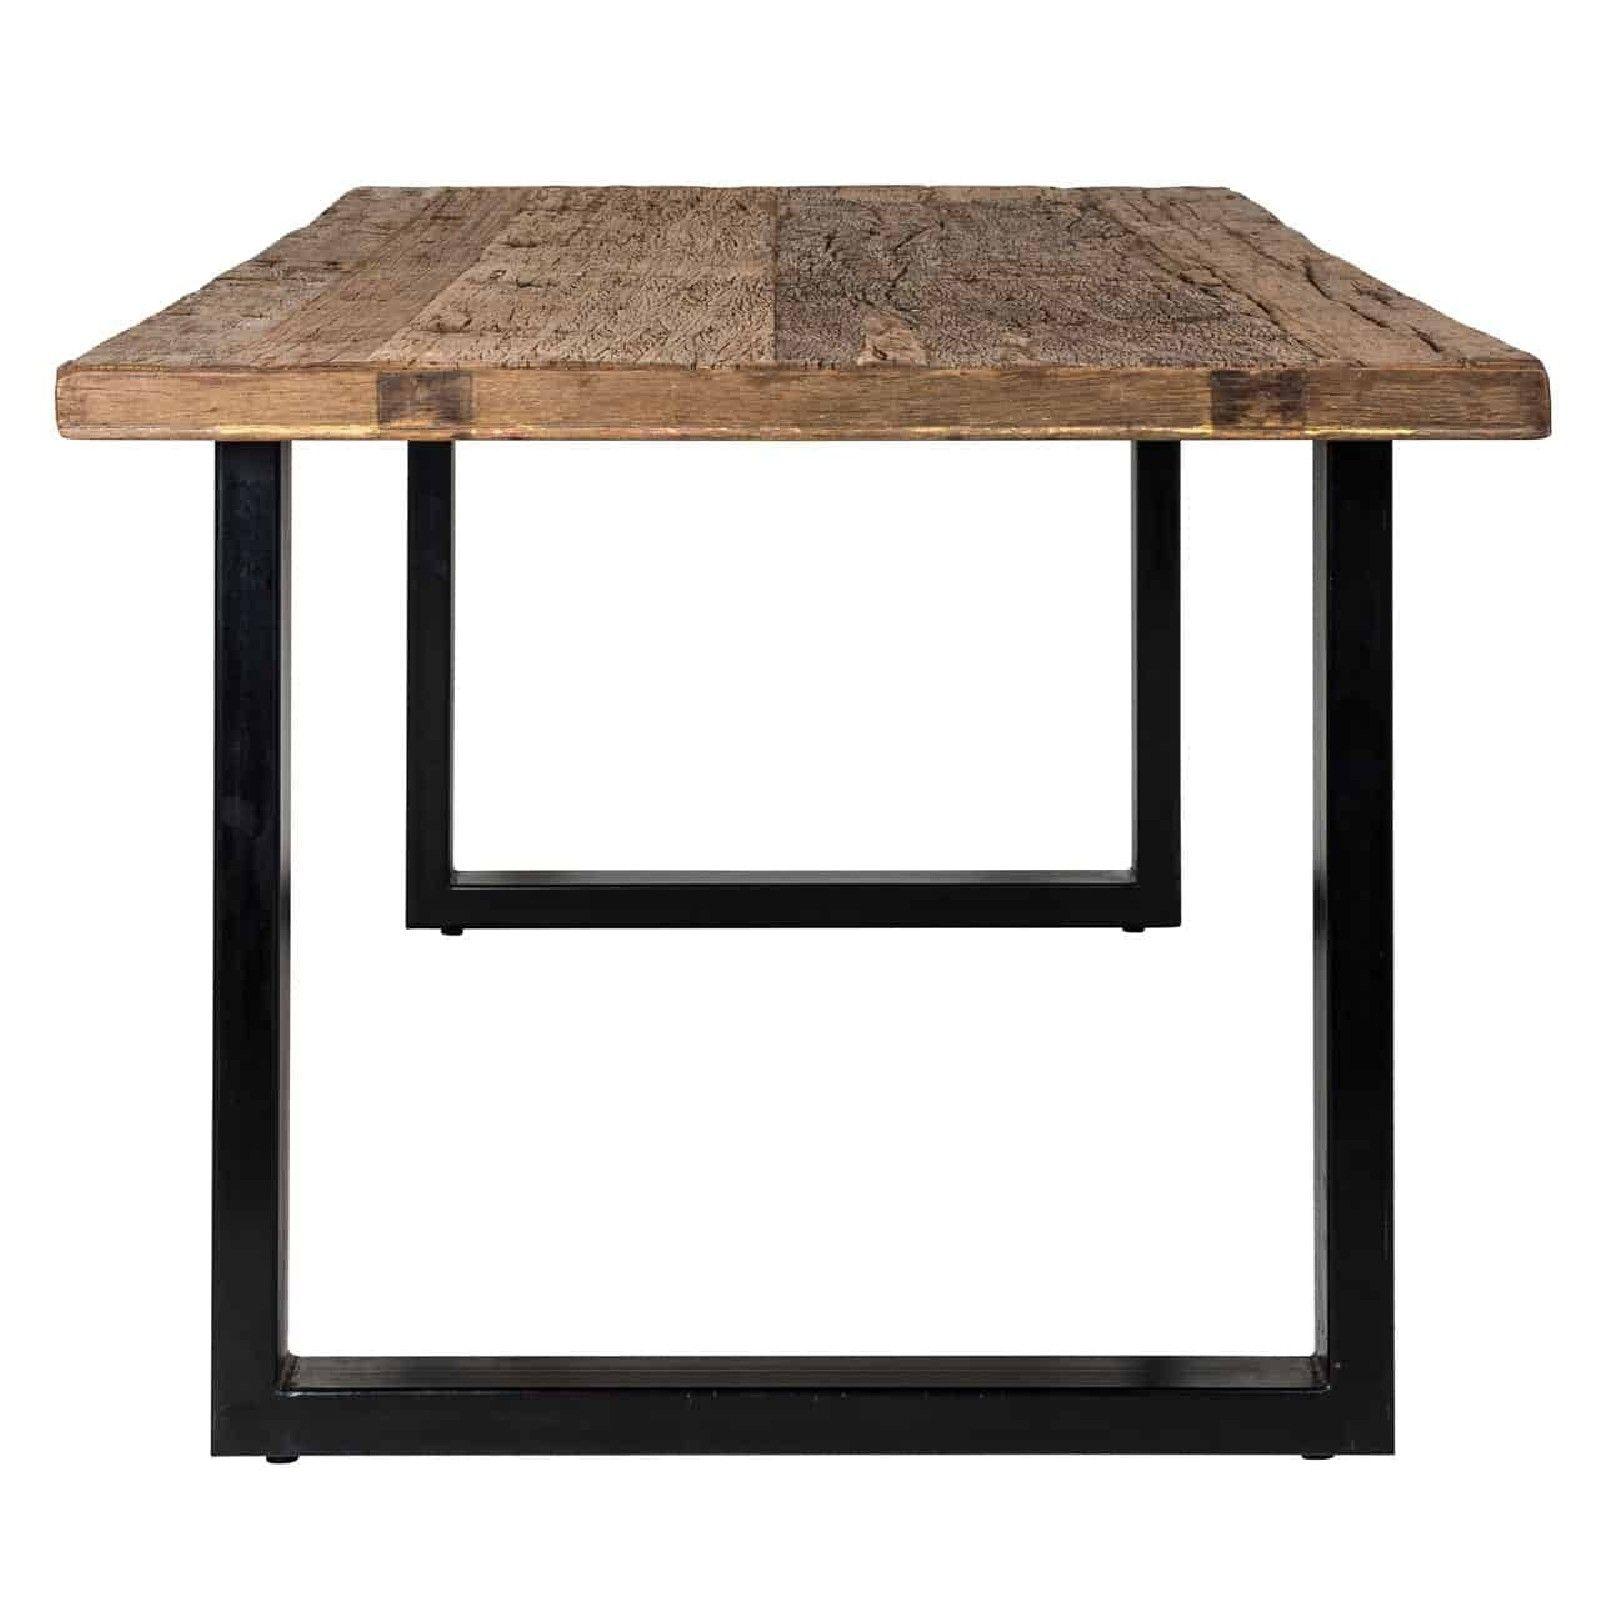 Table à dîner Raffles 200, Recyceld wood Meuble Déco Tendance - 130